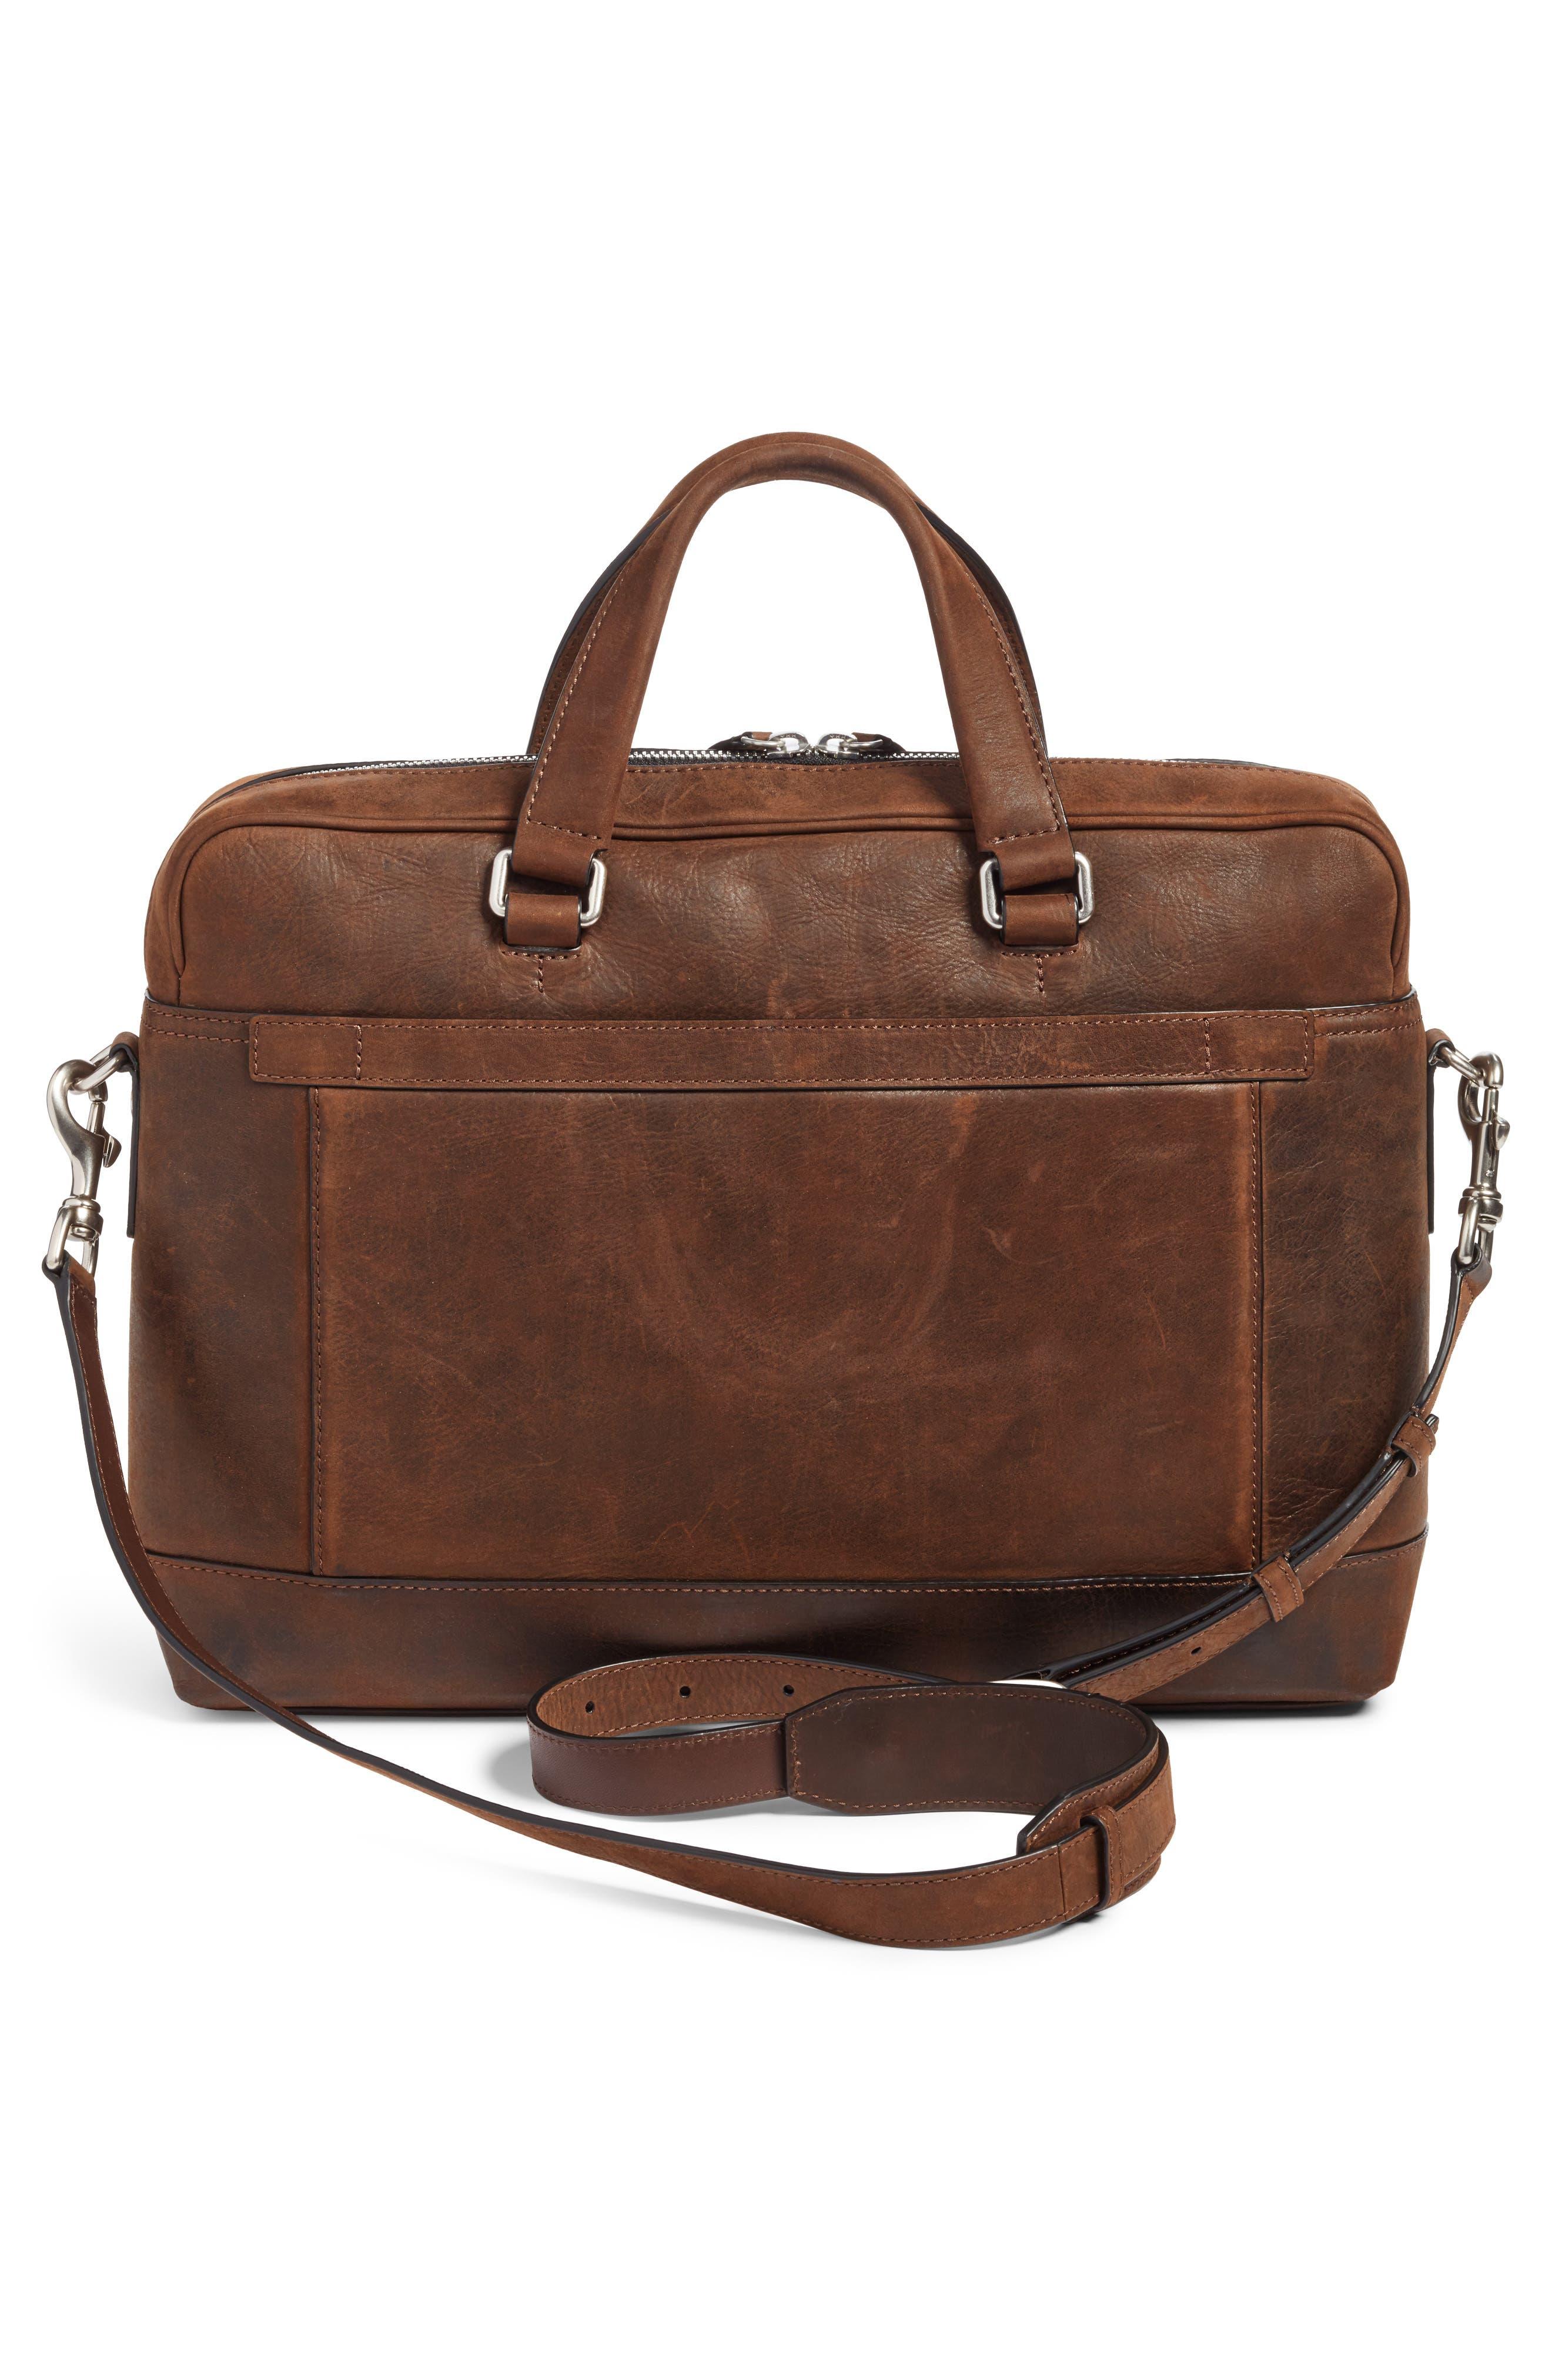 FRYE, Oliver Leather Briefcase, Alternate thumbnail 3, color, DARK BROWN